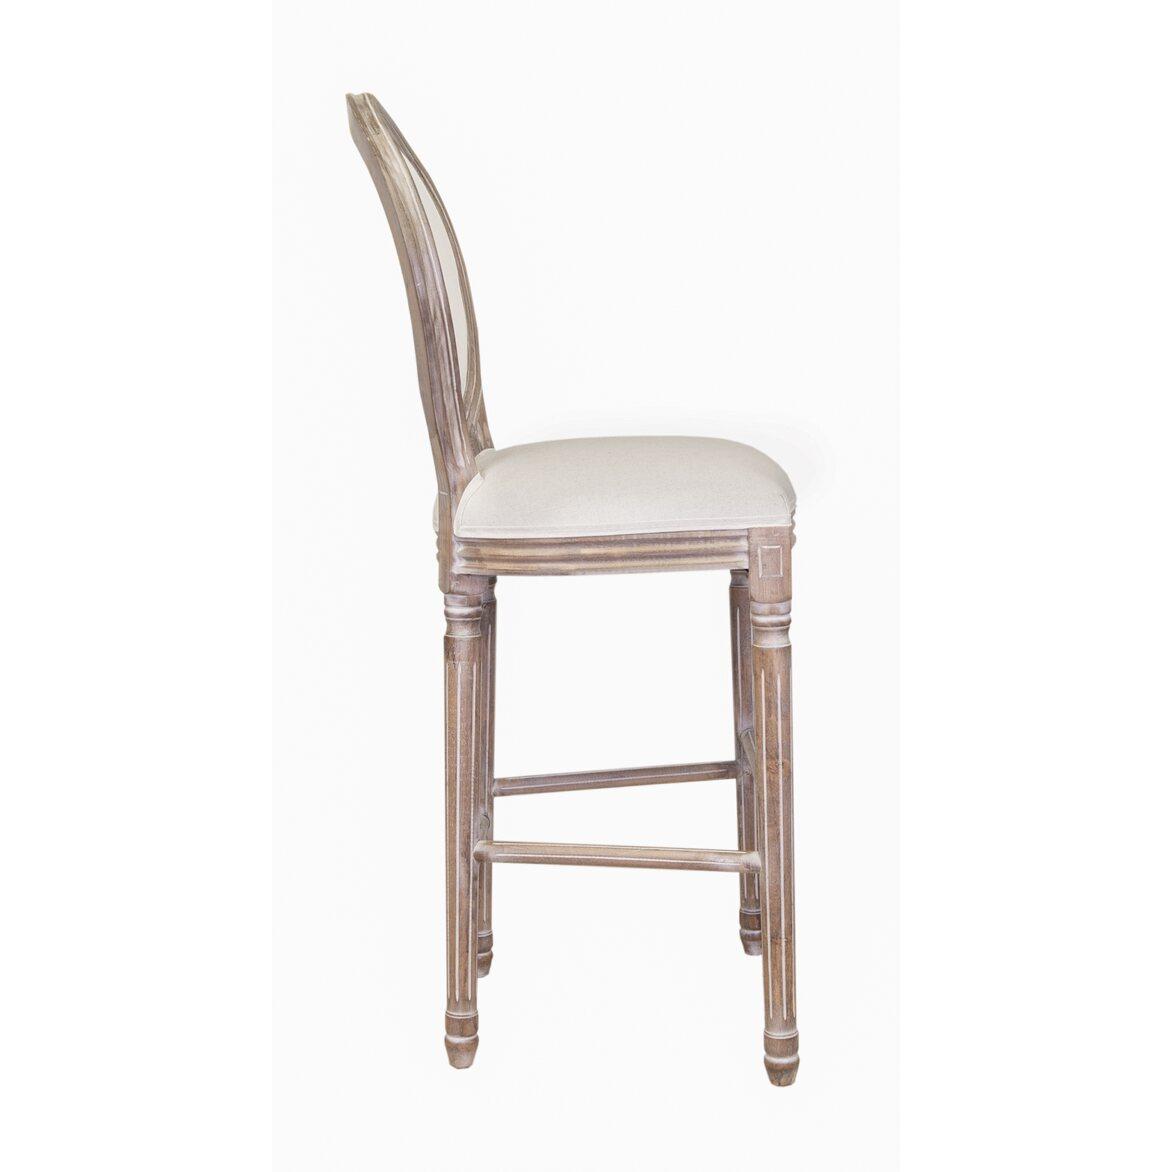 Барный стул Filon ver.2 2 | Барные стулья Kingsby